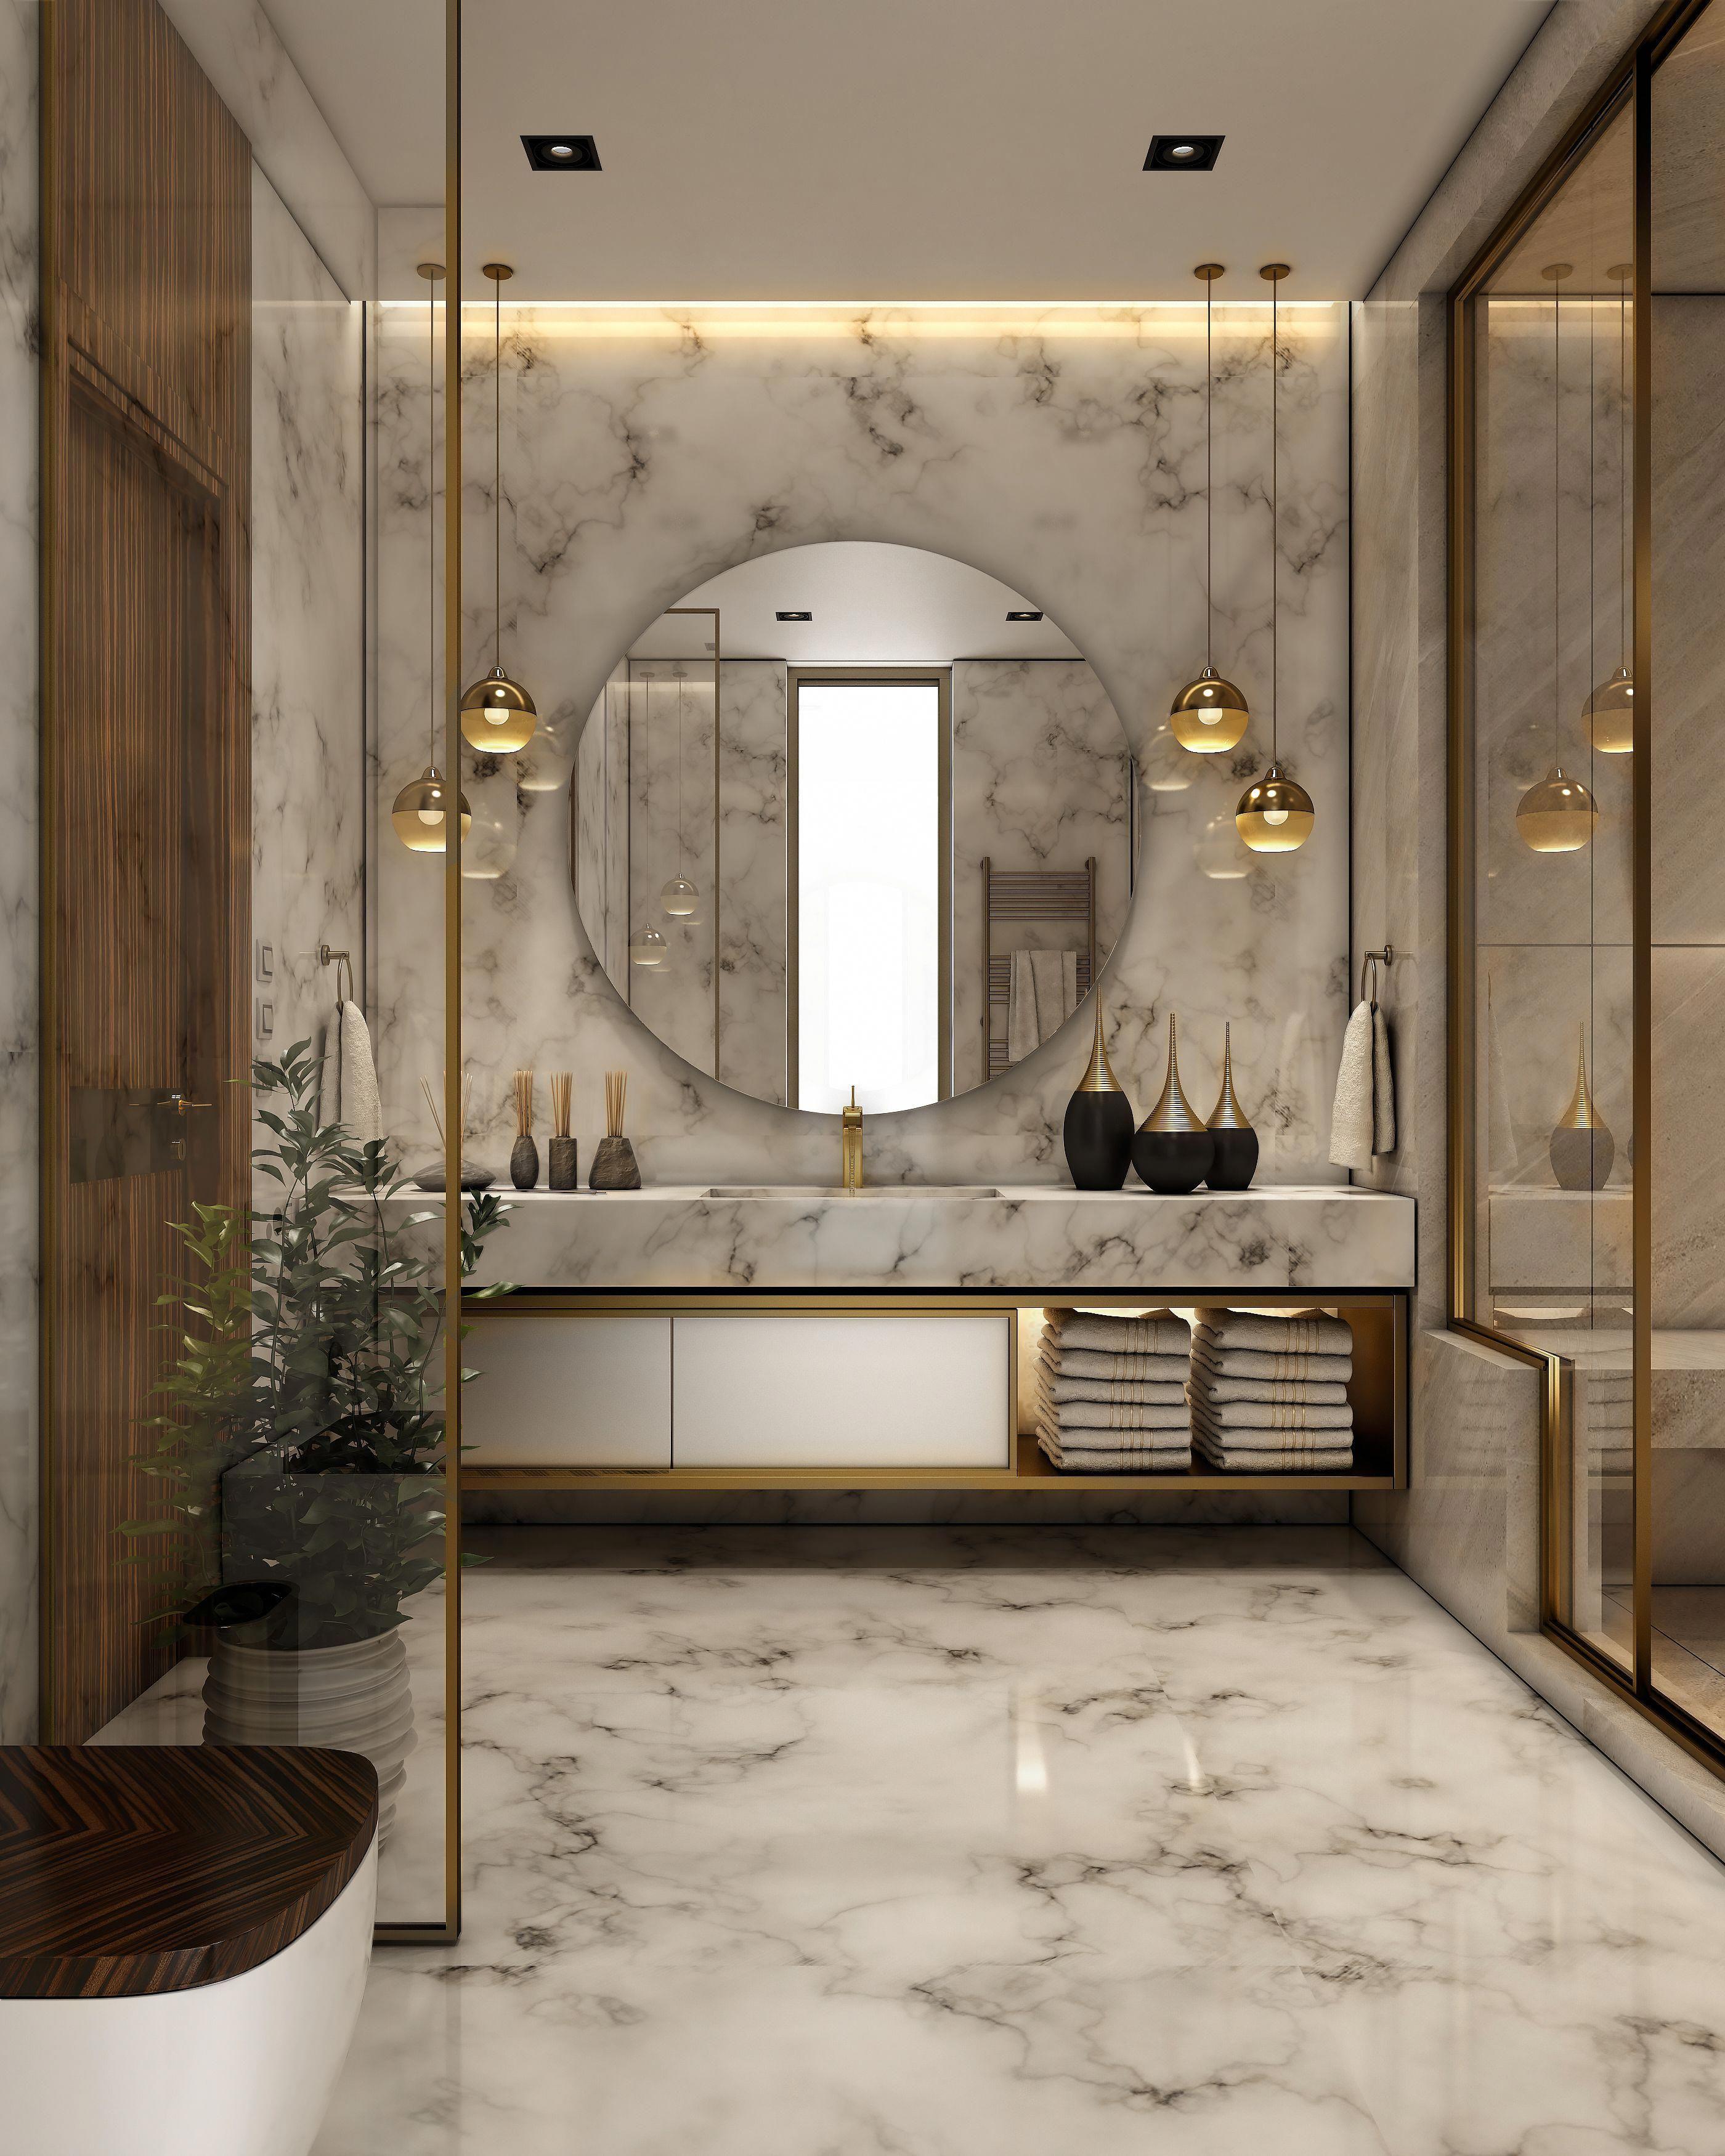 gold and black bathroom ideas  Bathroom remodel cost, Bathroom